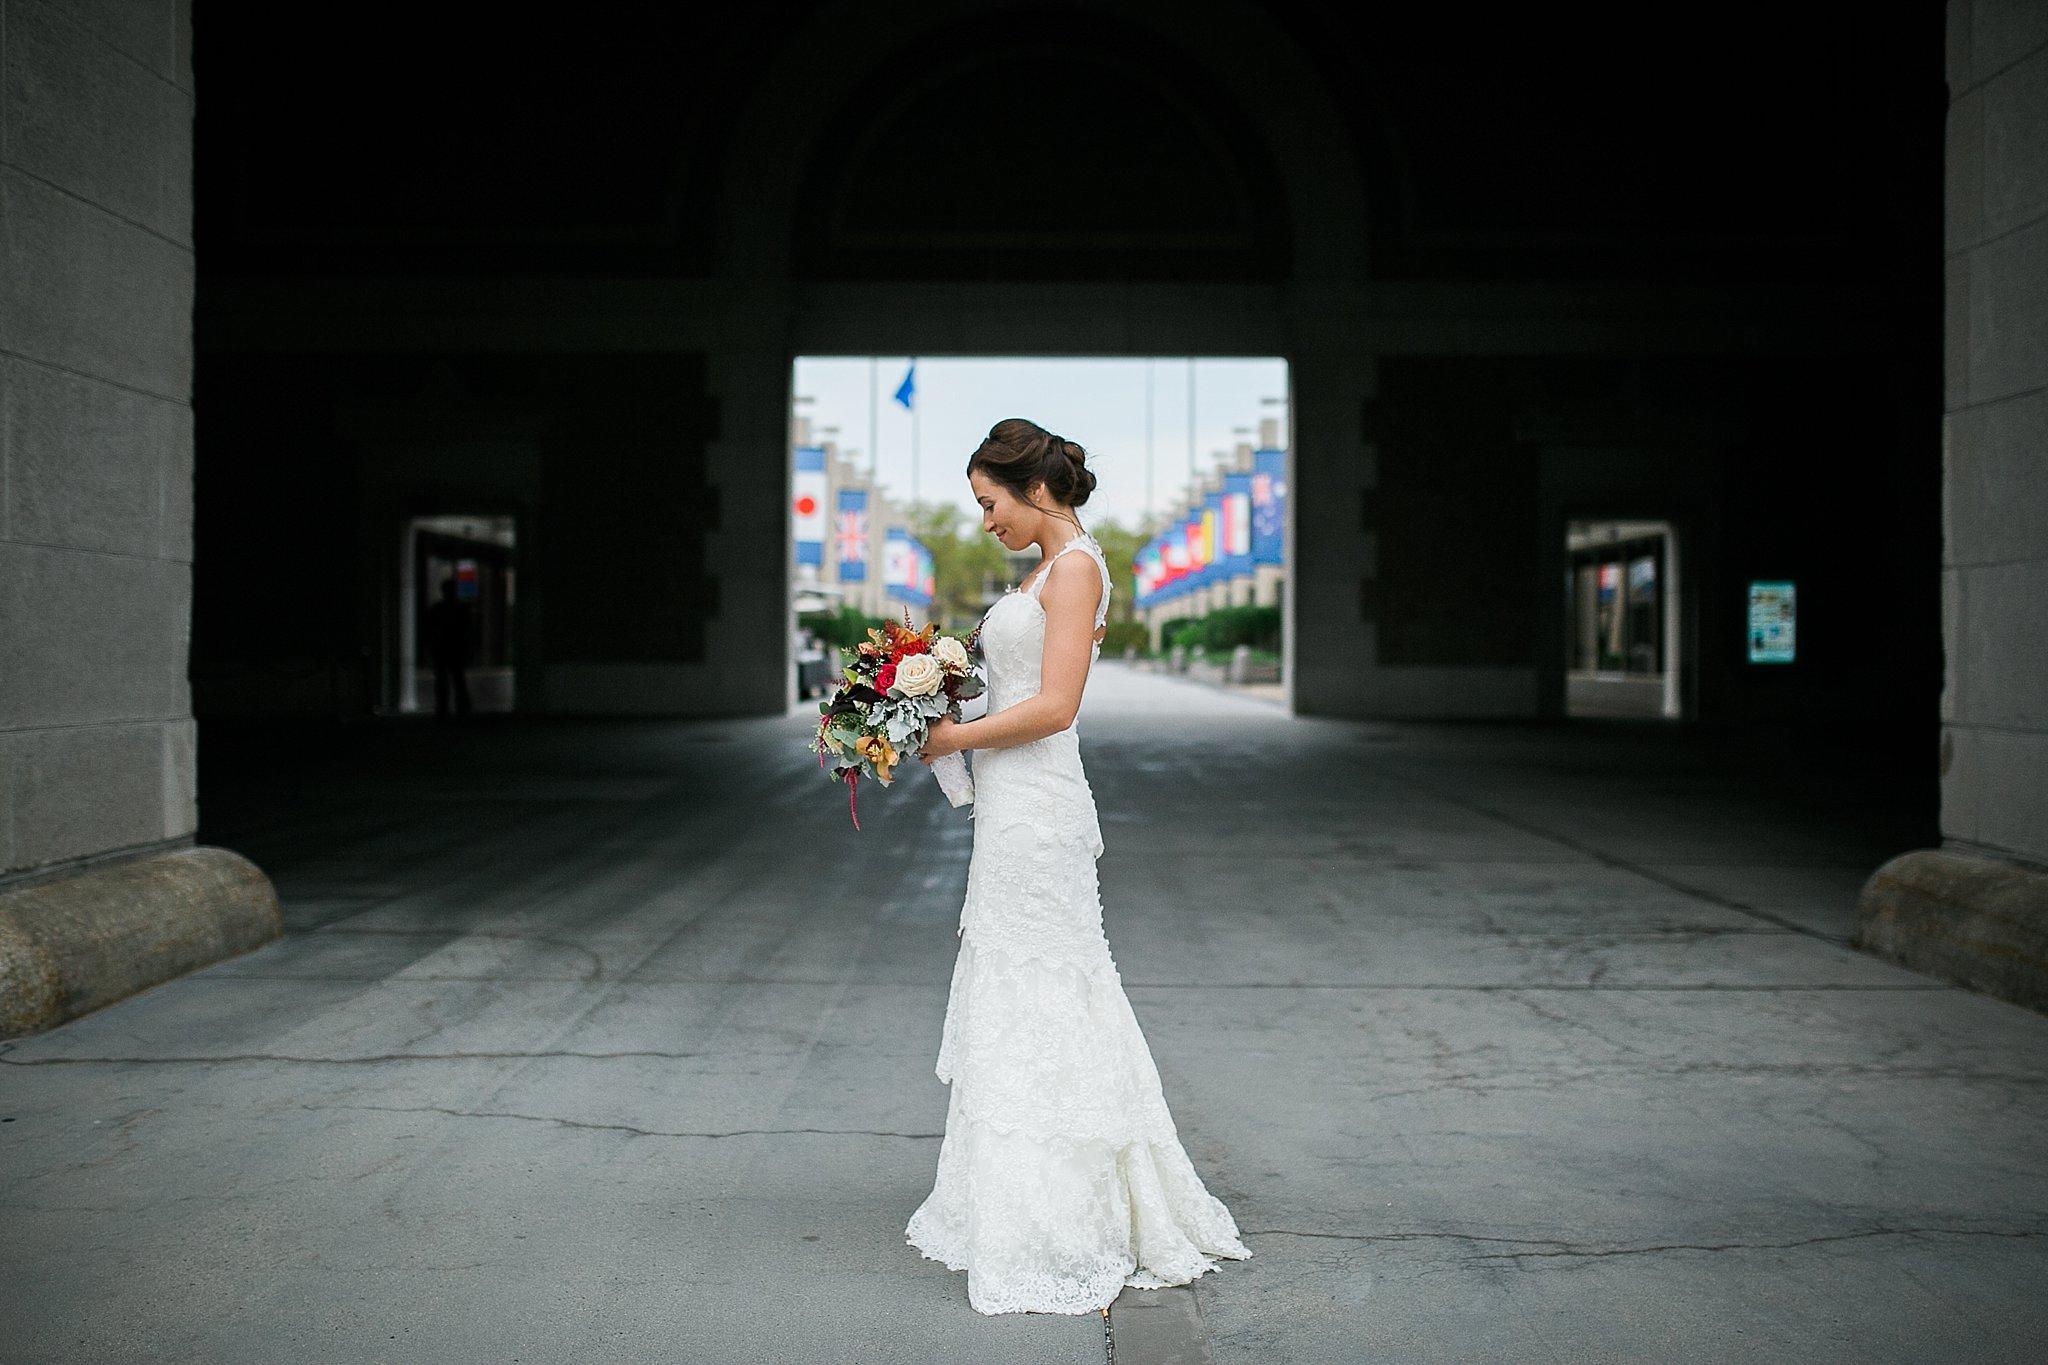 Seaport Hotel Wedding Boston Photographer Sweet Alice57.jpg